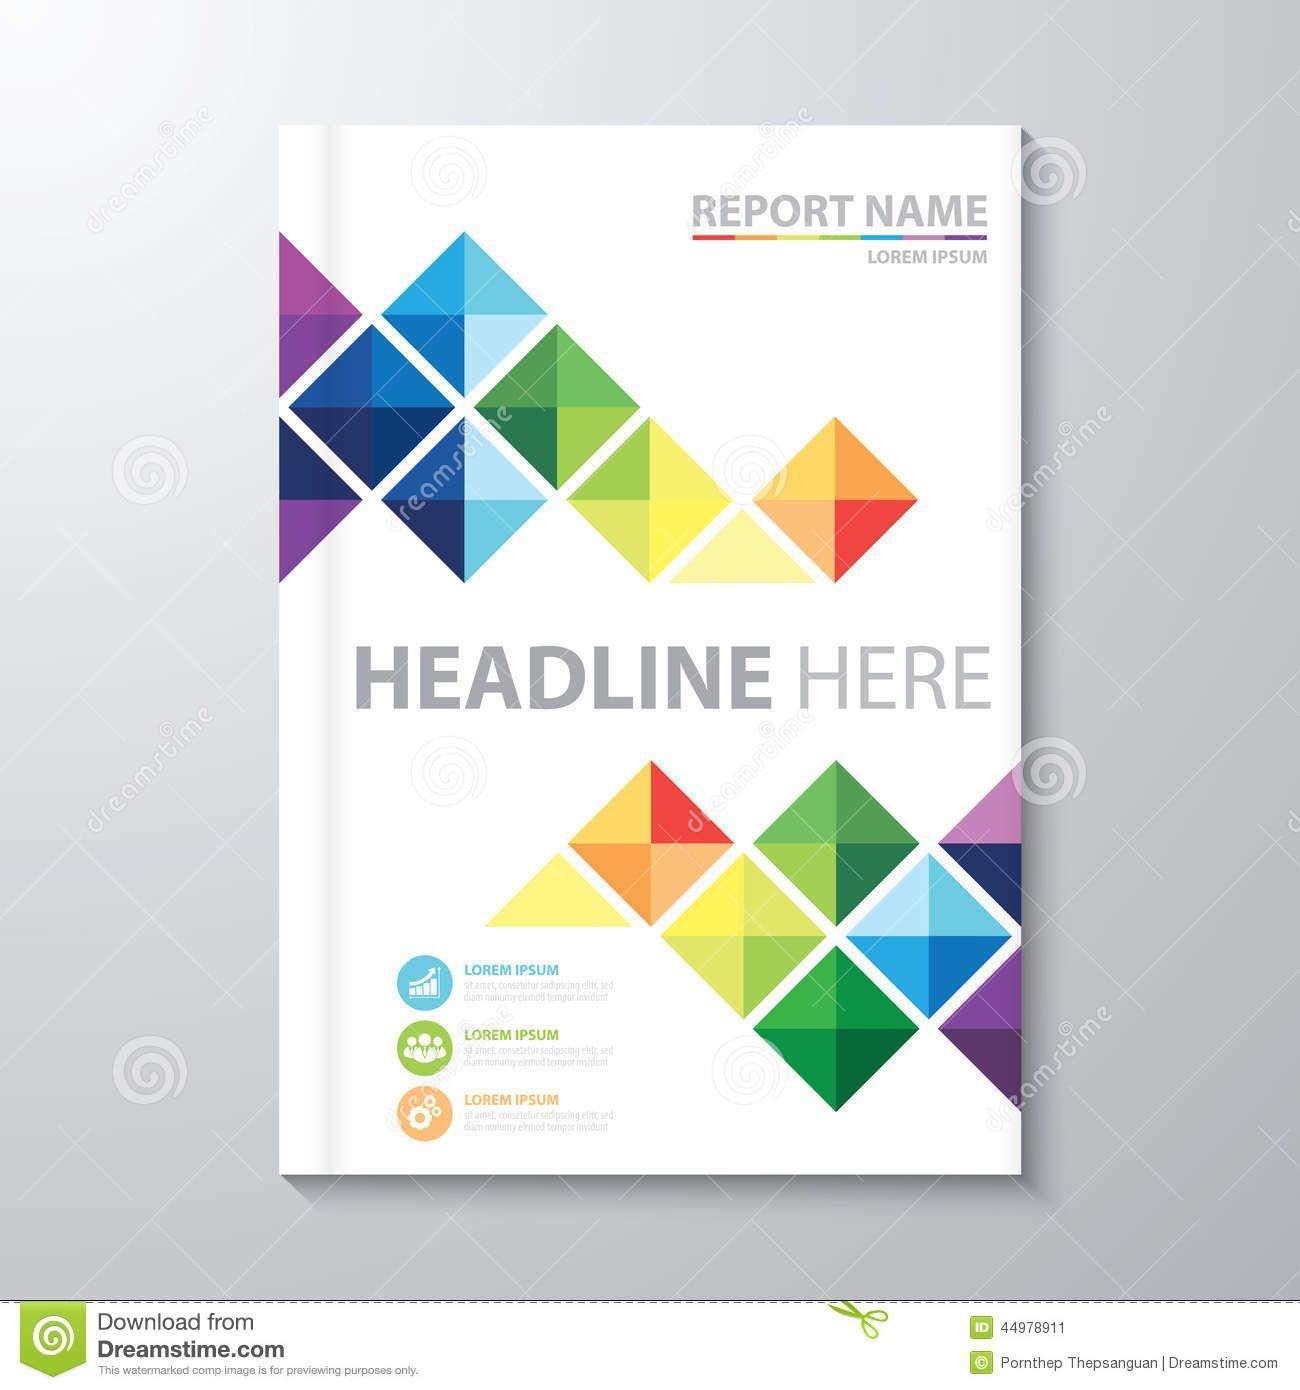 Cover Annual Report Stock Vector. Illustration Of Artwork Regarding Annual Report Word Template